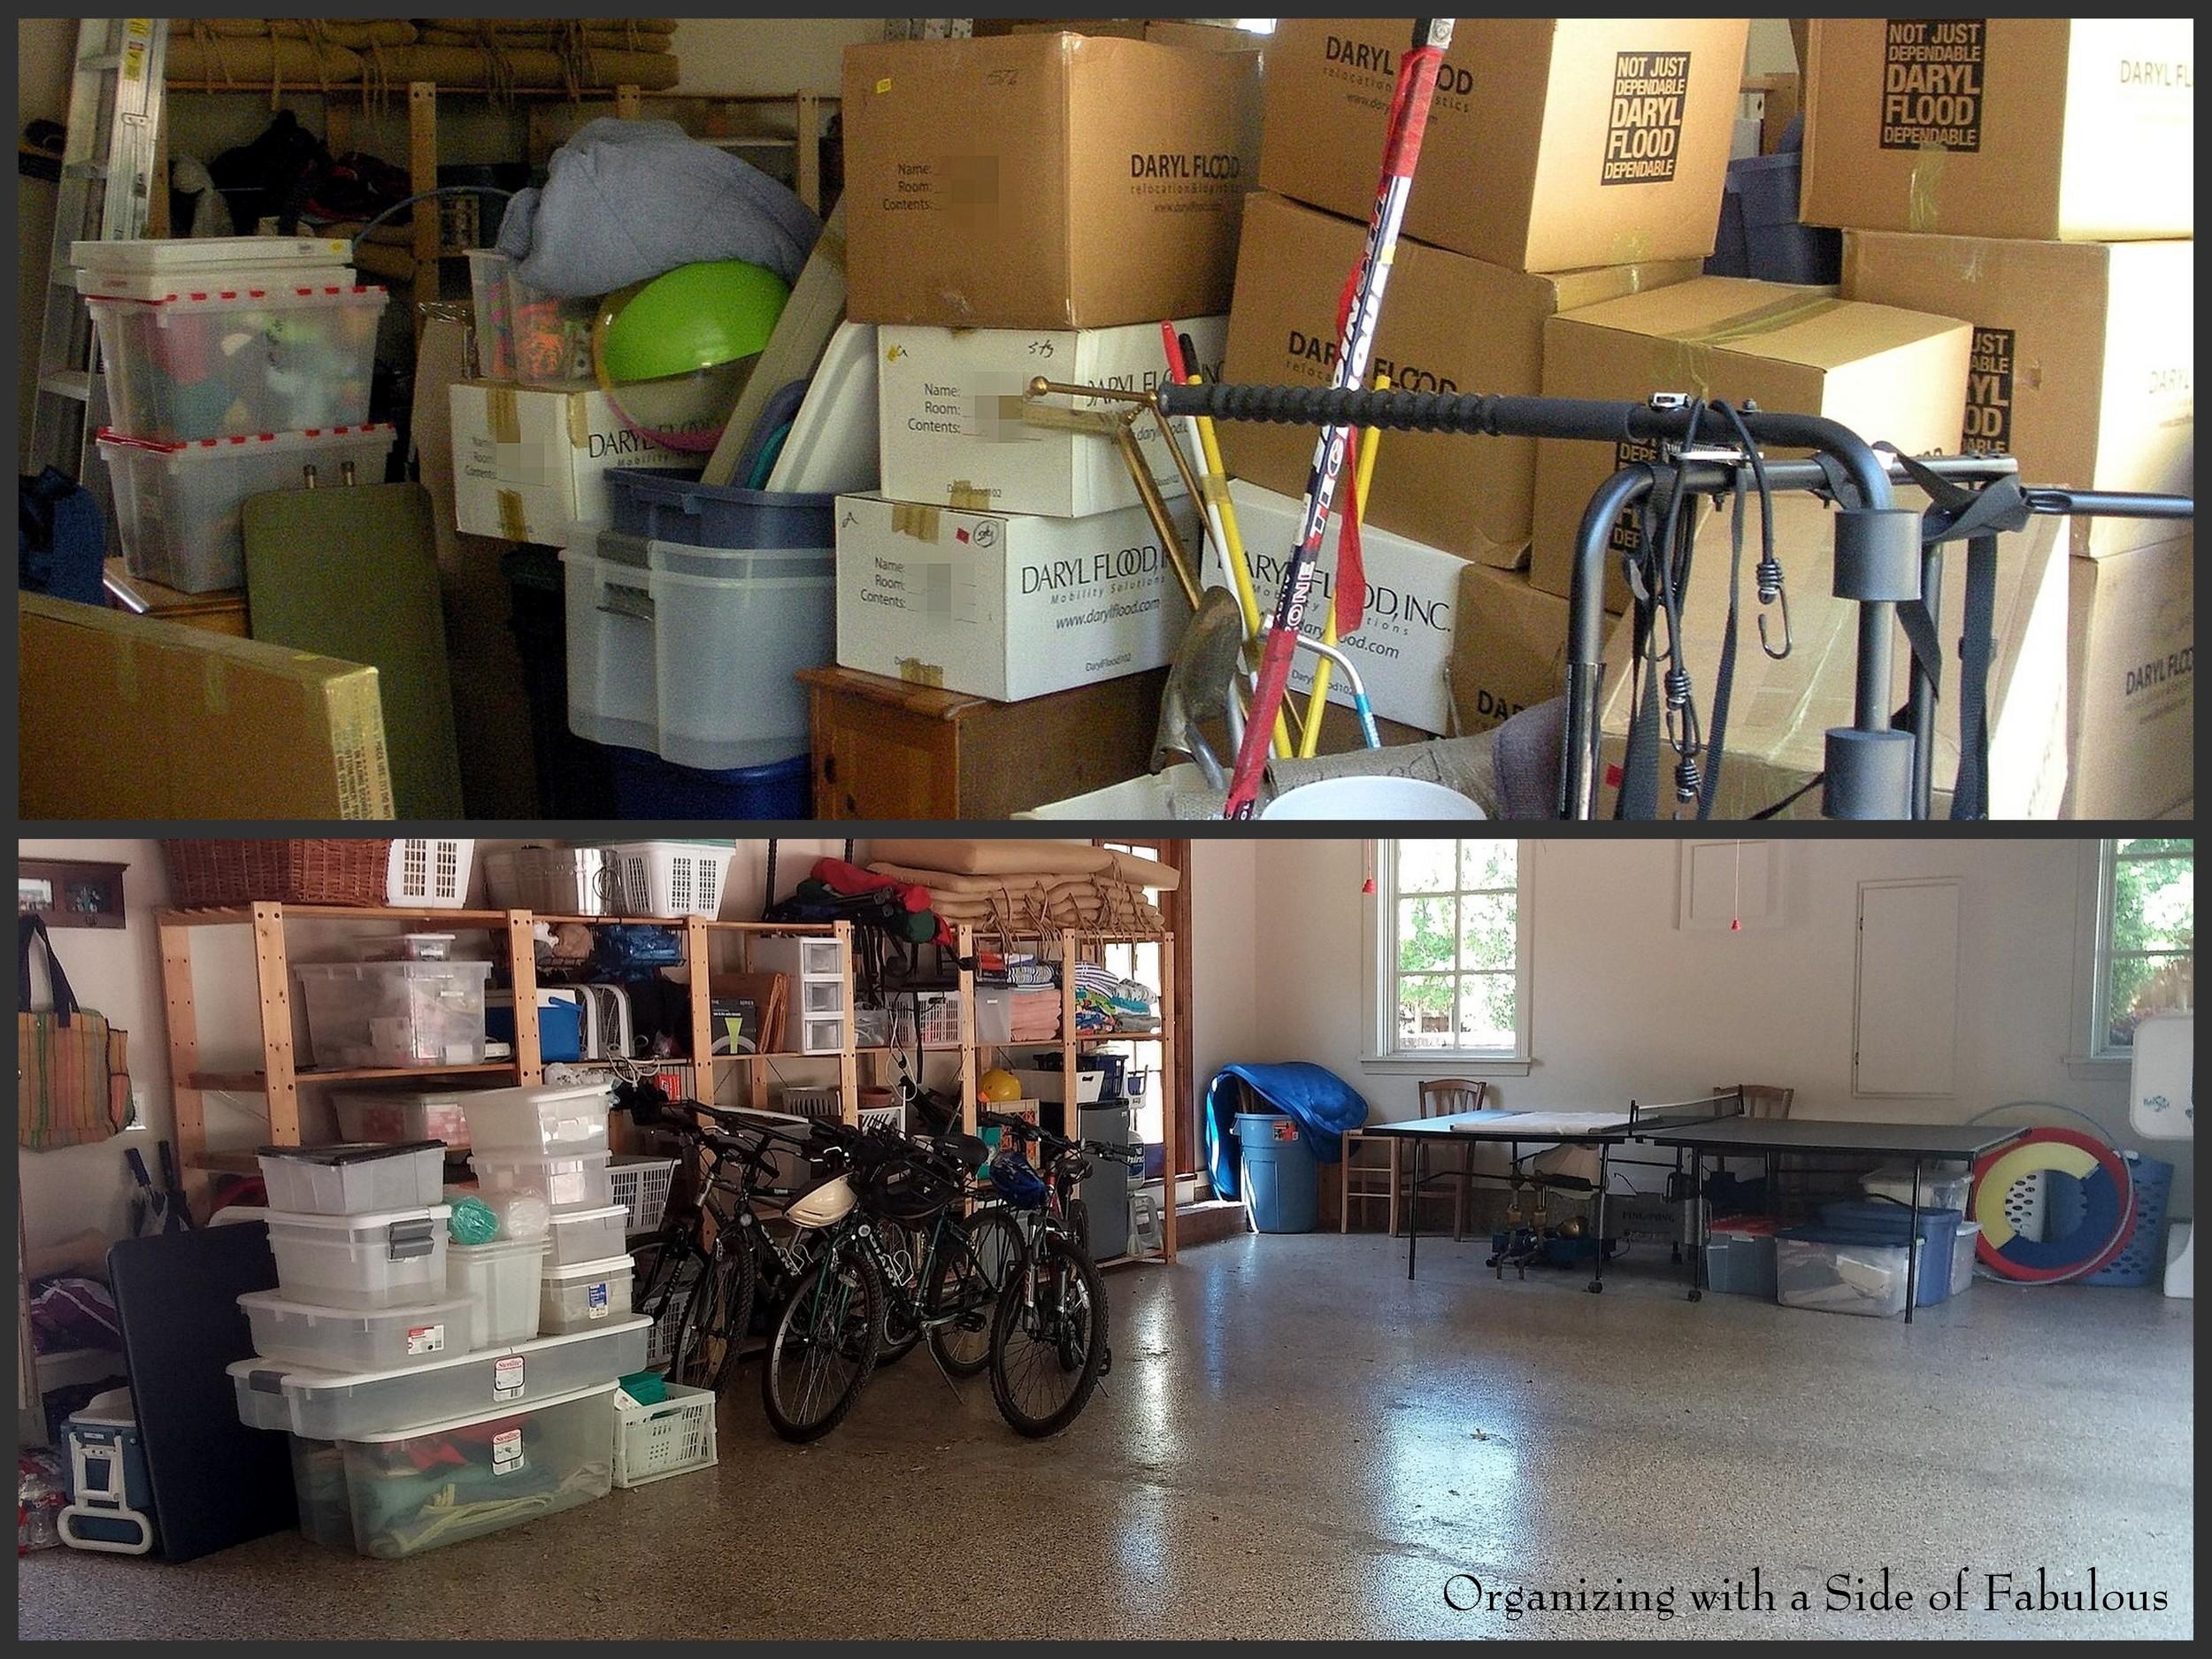 Garage Organization - Organizing with a Side of Fabulous Blog